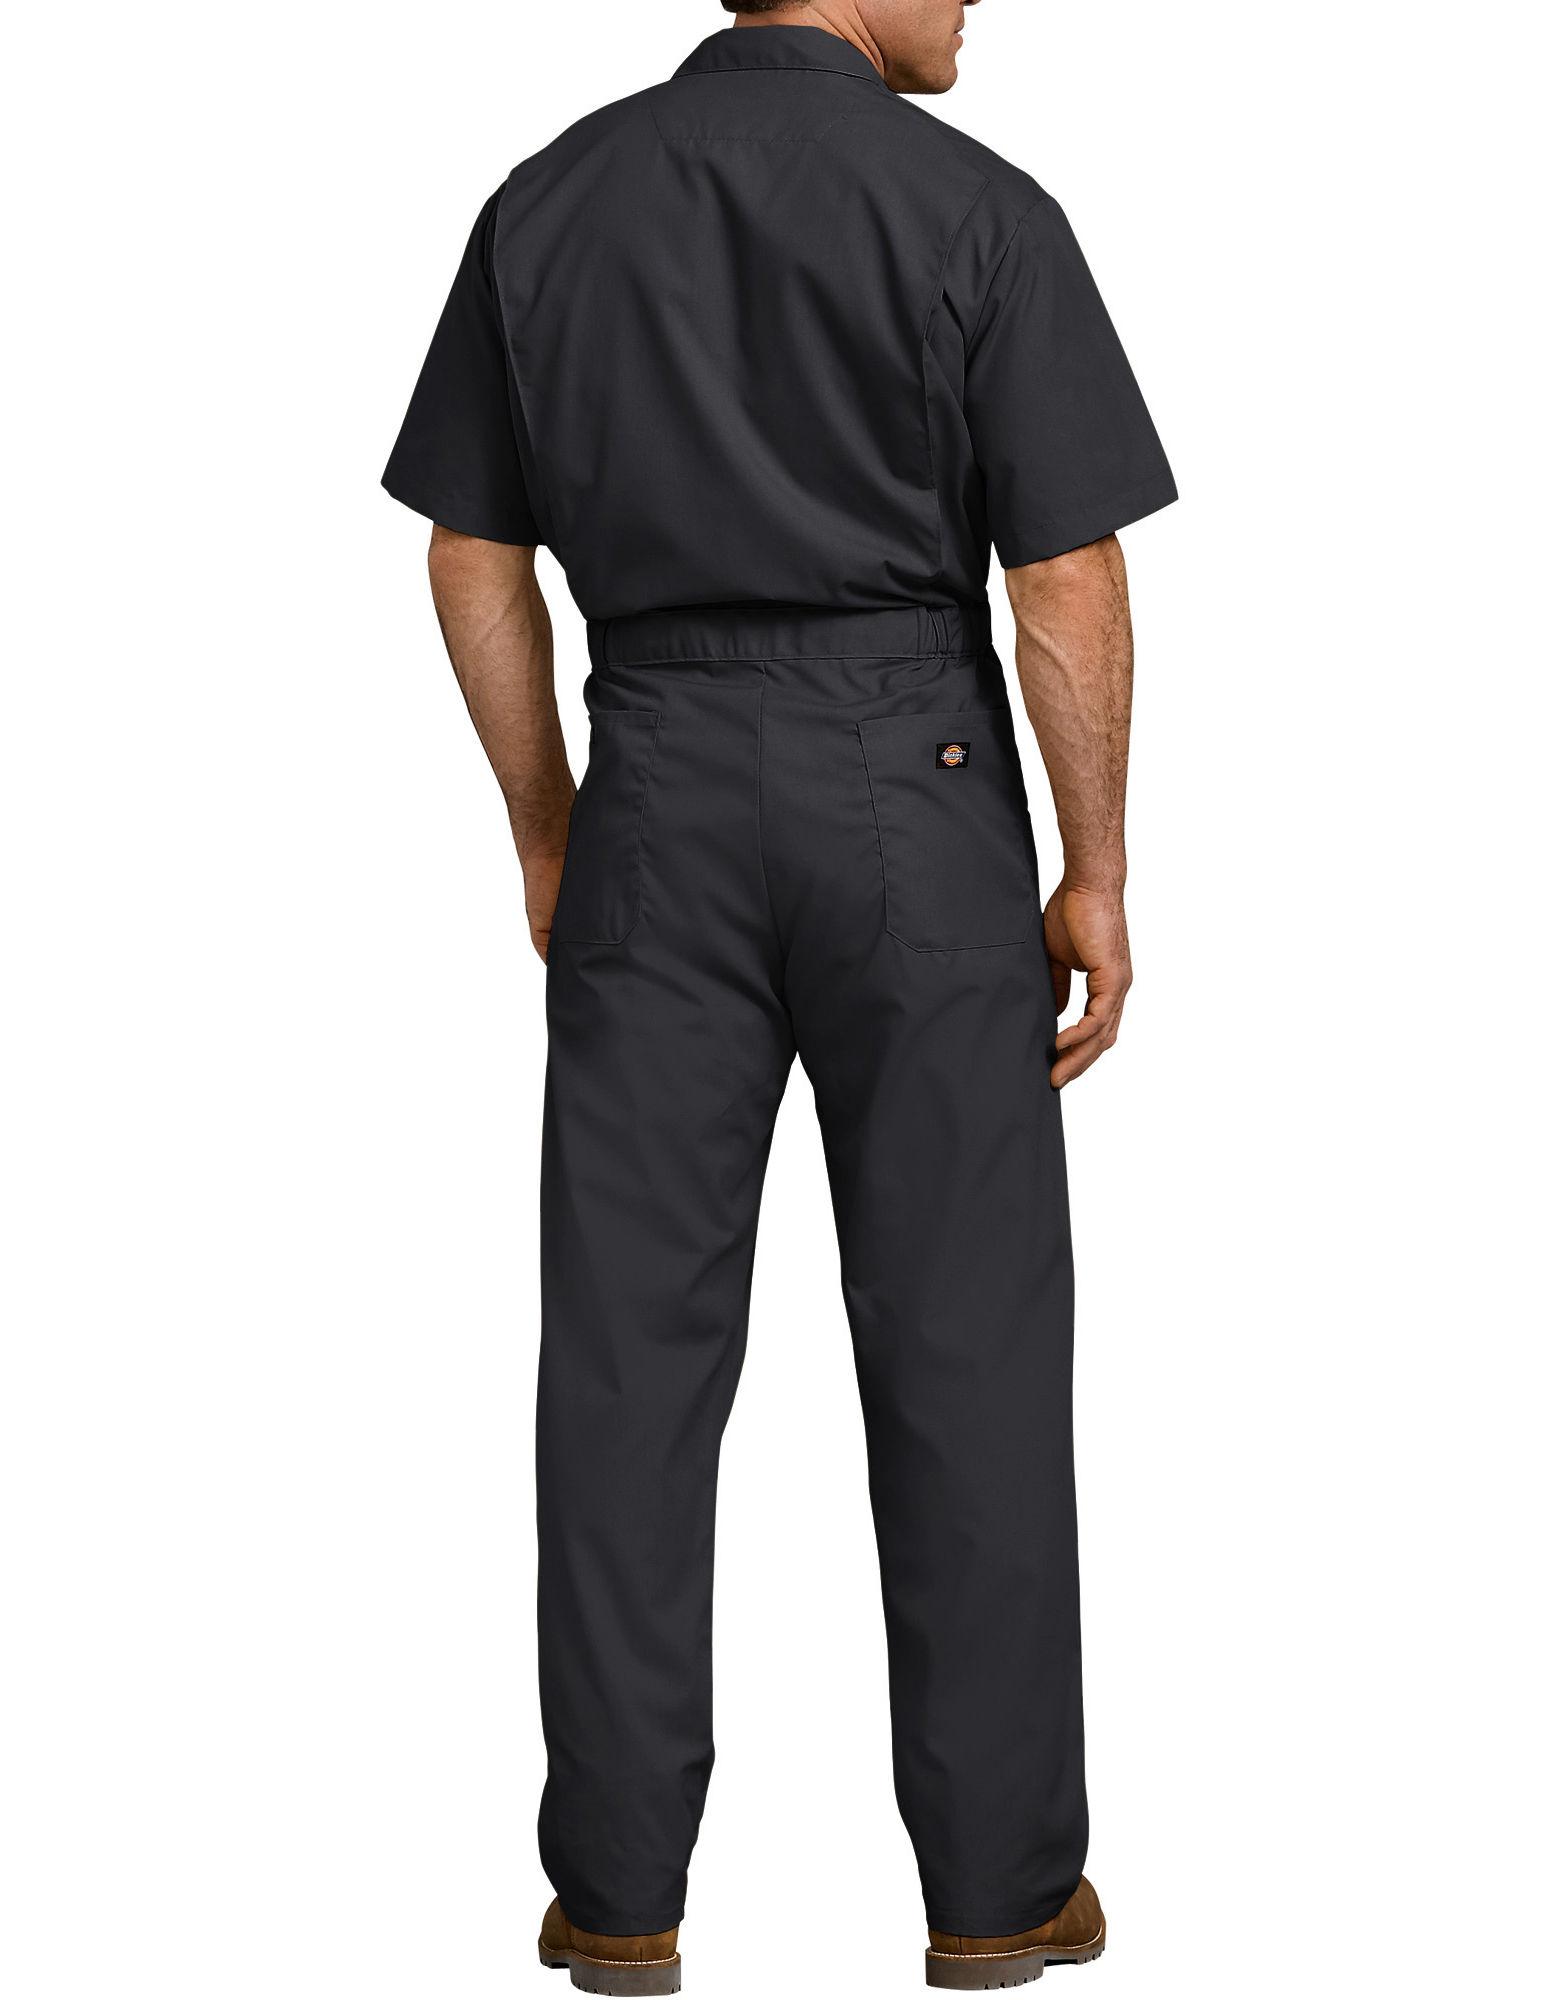 Dickies-Men-039-s-Short-Sleeve-Coveralls-Elastic-Waist-Work-Wear-Uniform thumbnail 3